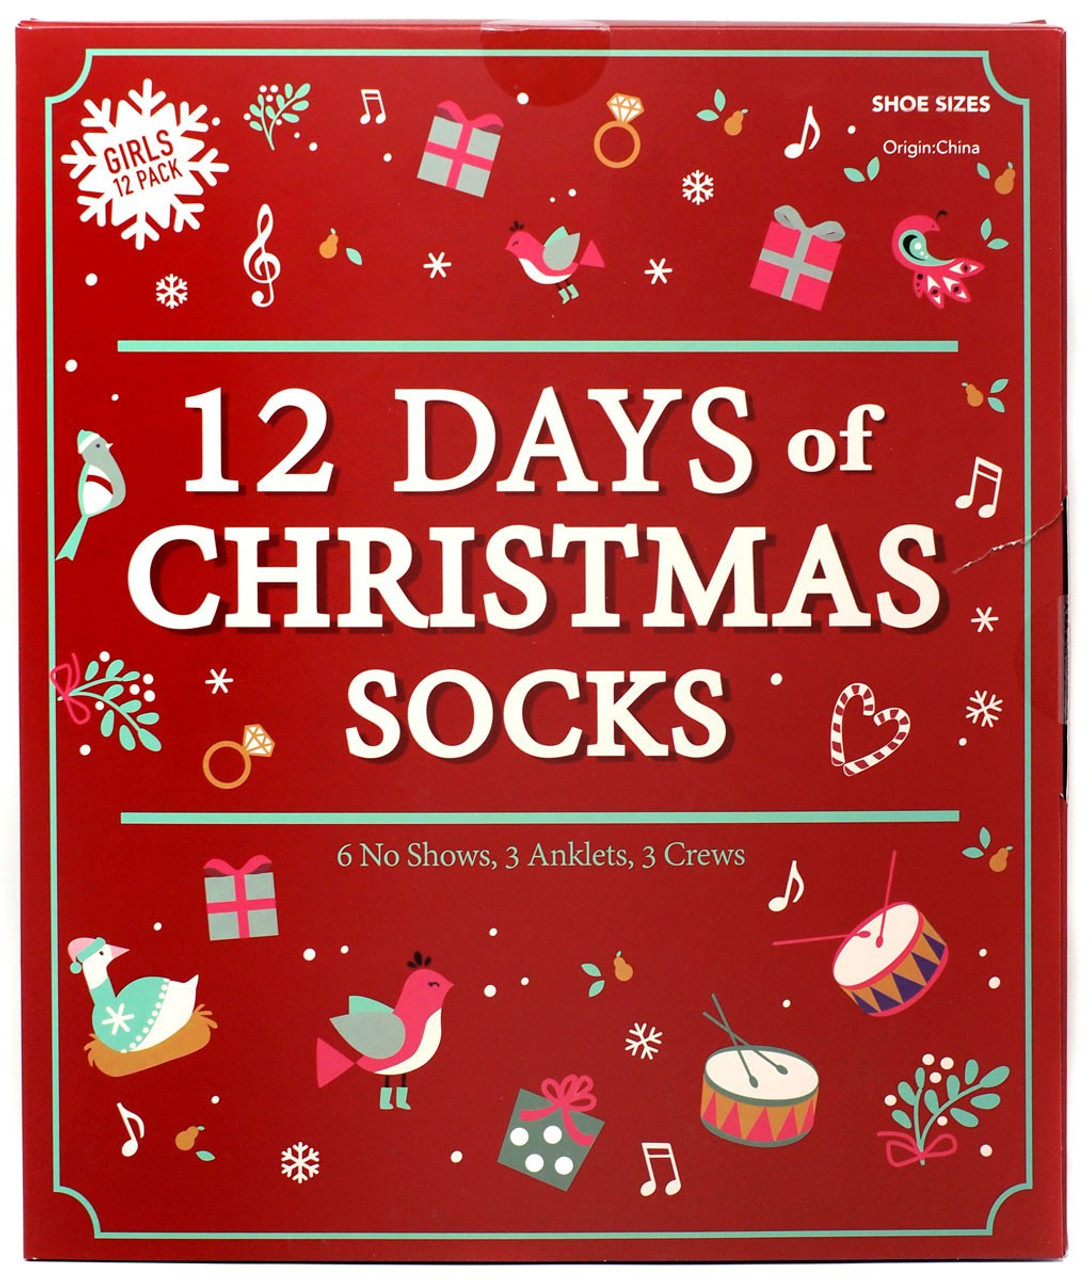 STAR WARS Disney 12 Days Of Socks Kids Size Large Shoe Size 3-10 *Christmas*